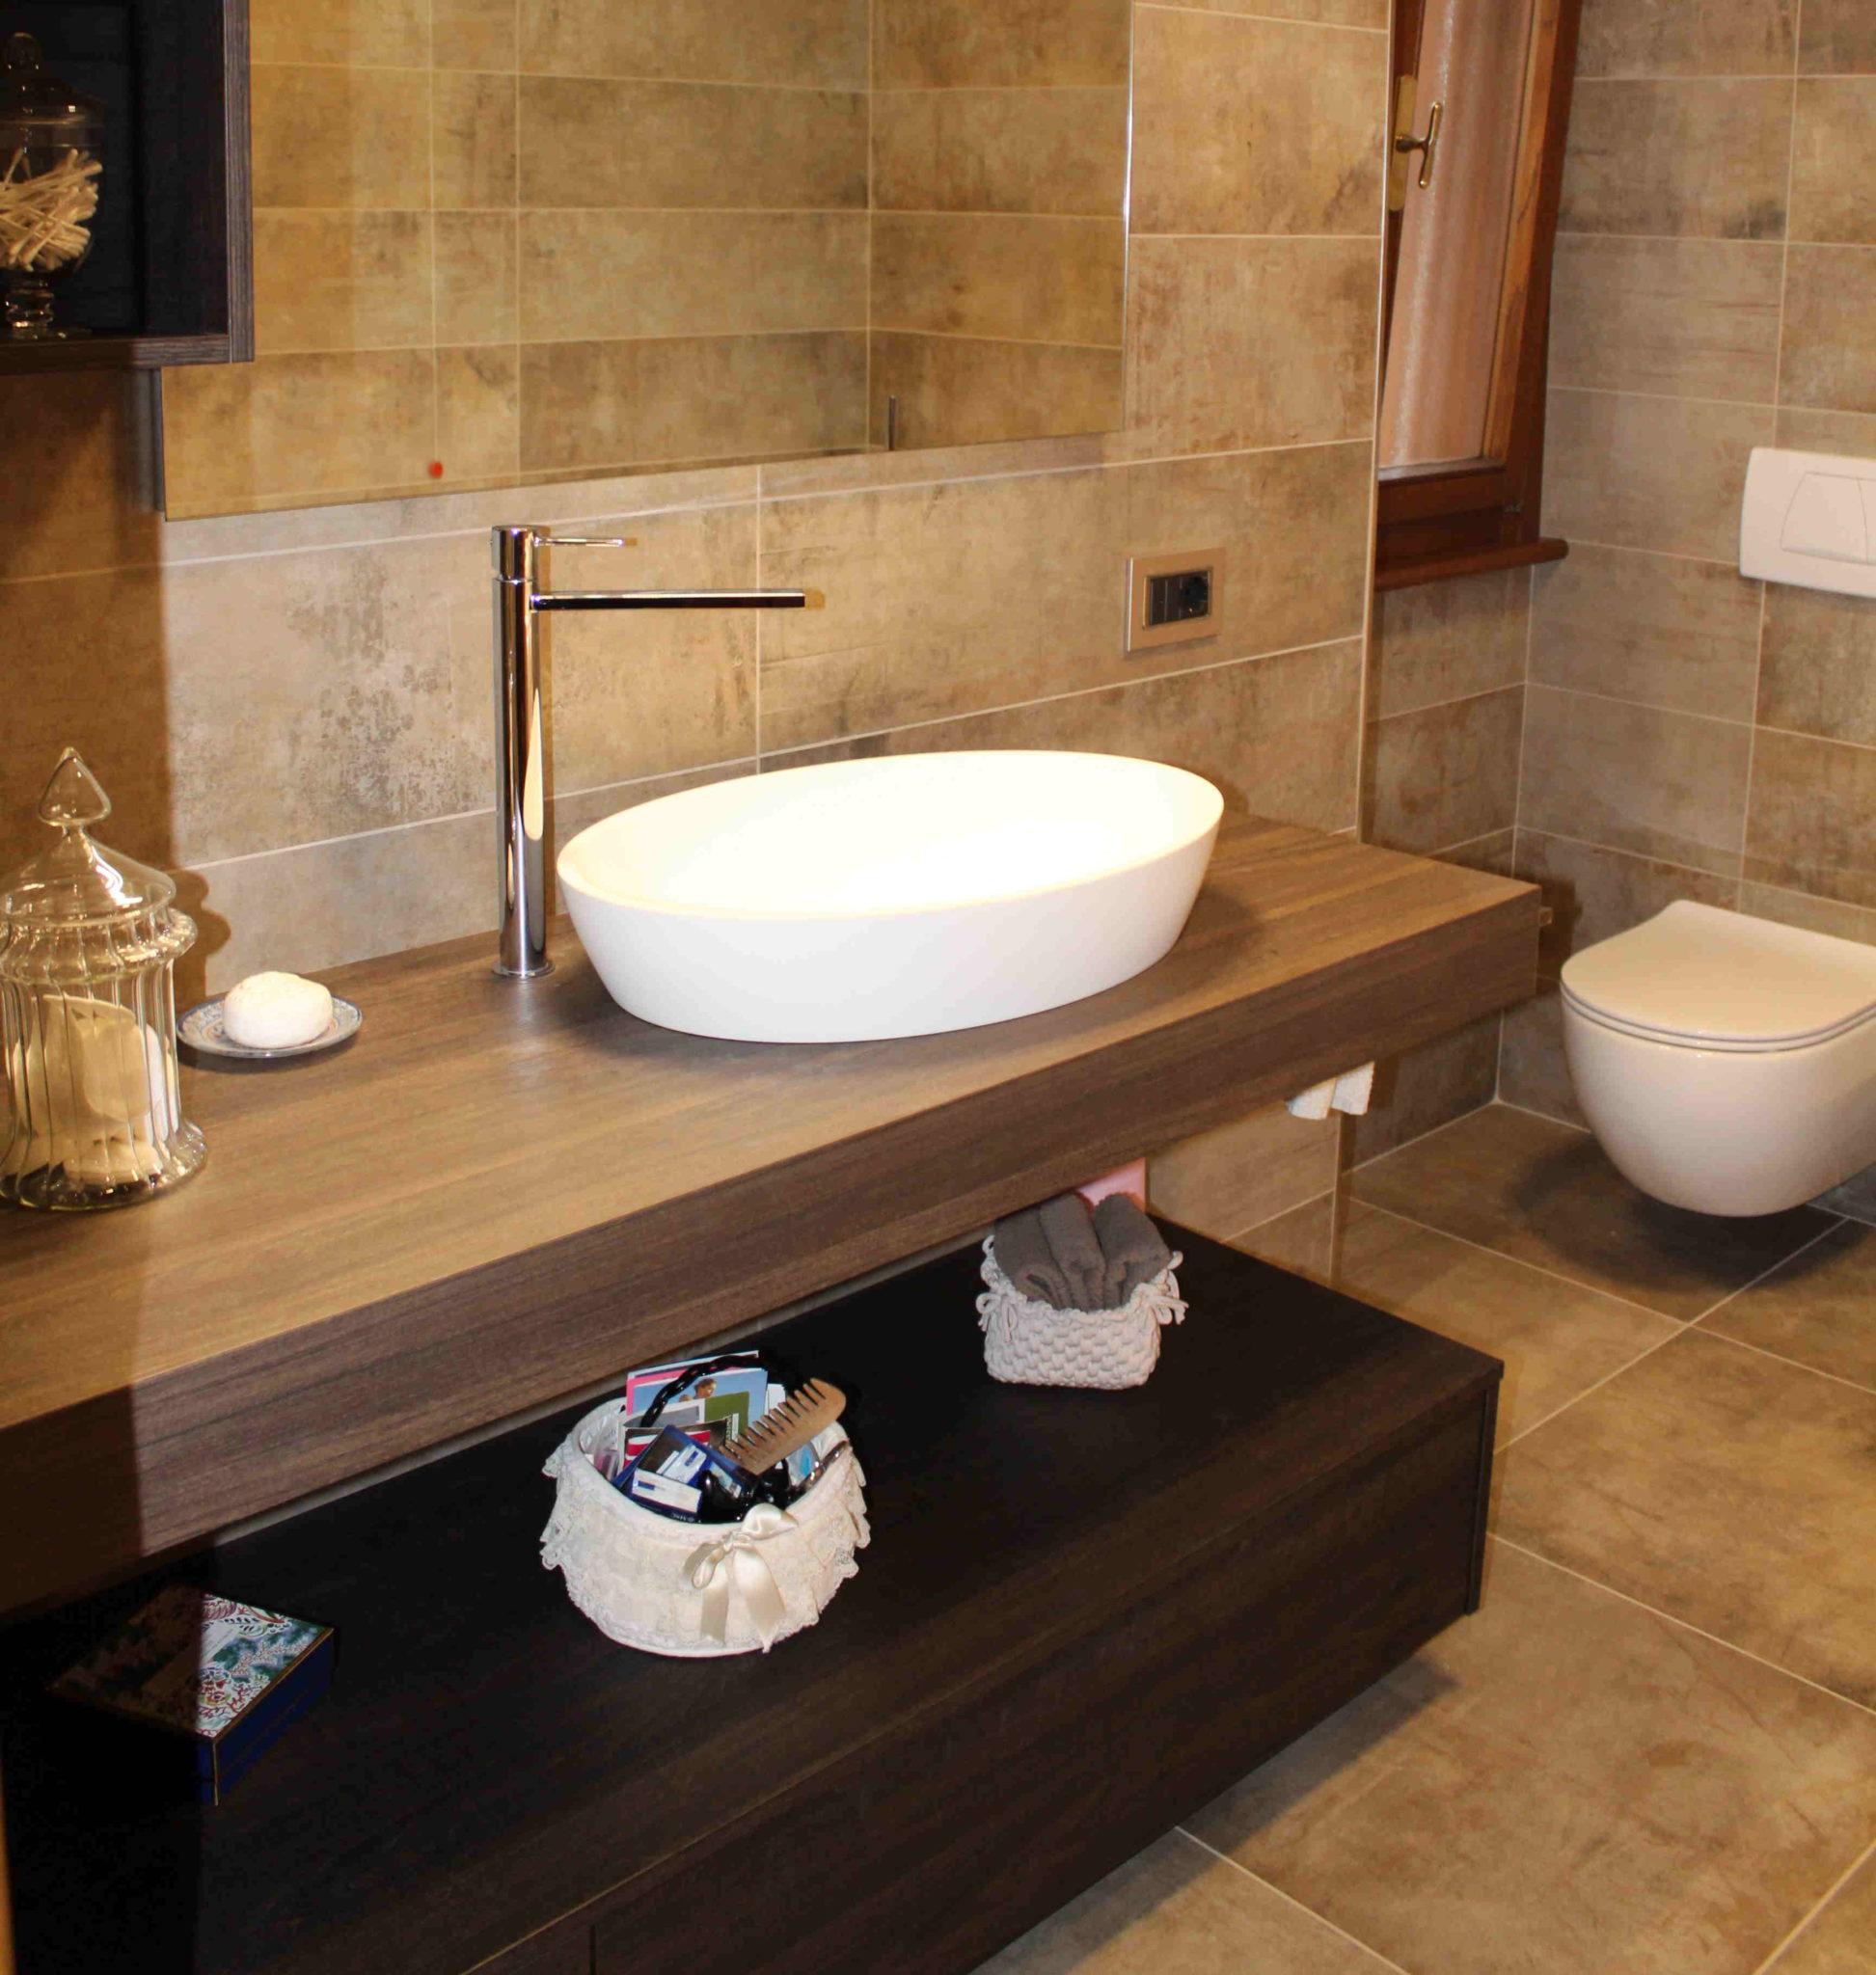 Arredo bagno,mobili bagno,mobili bagno sospesi e a terra - IMG 03318 1